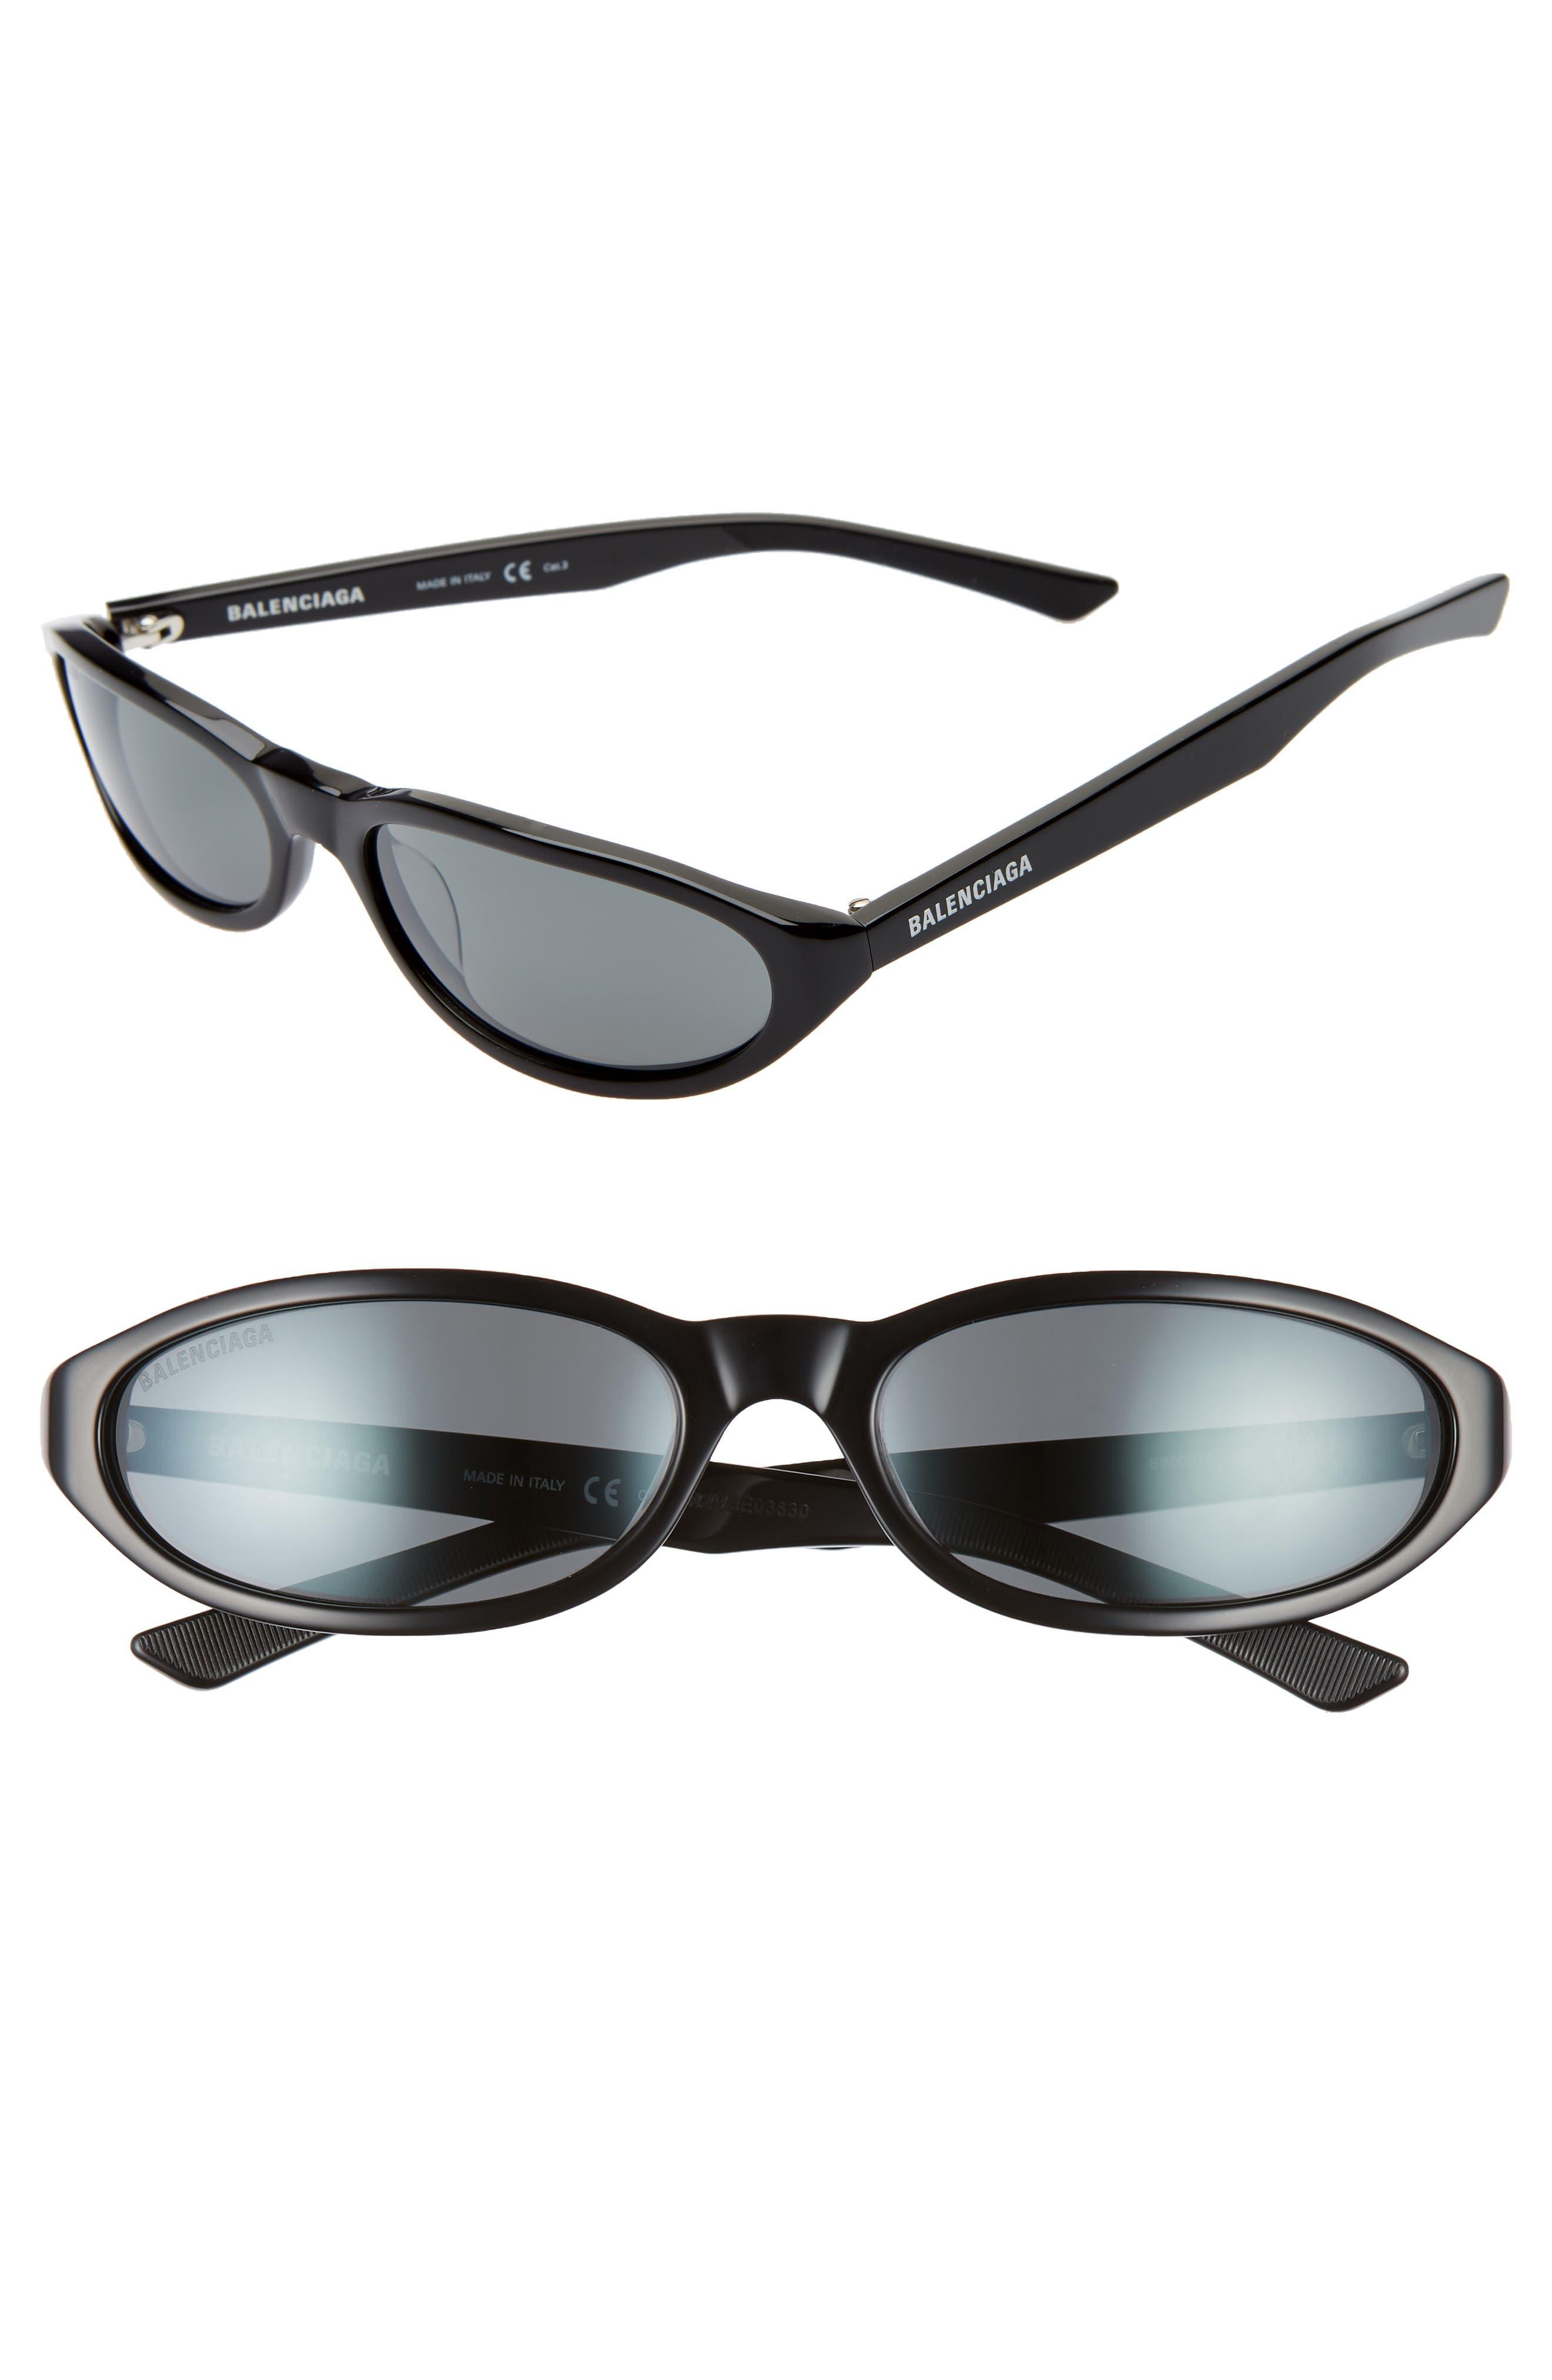 BALENCIAGA 59mm Cateye Sunglasses, Main, color, SHINY BLACK/ GREY